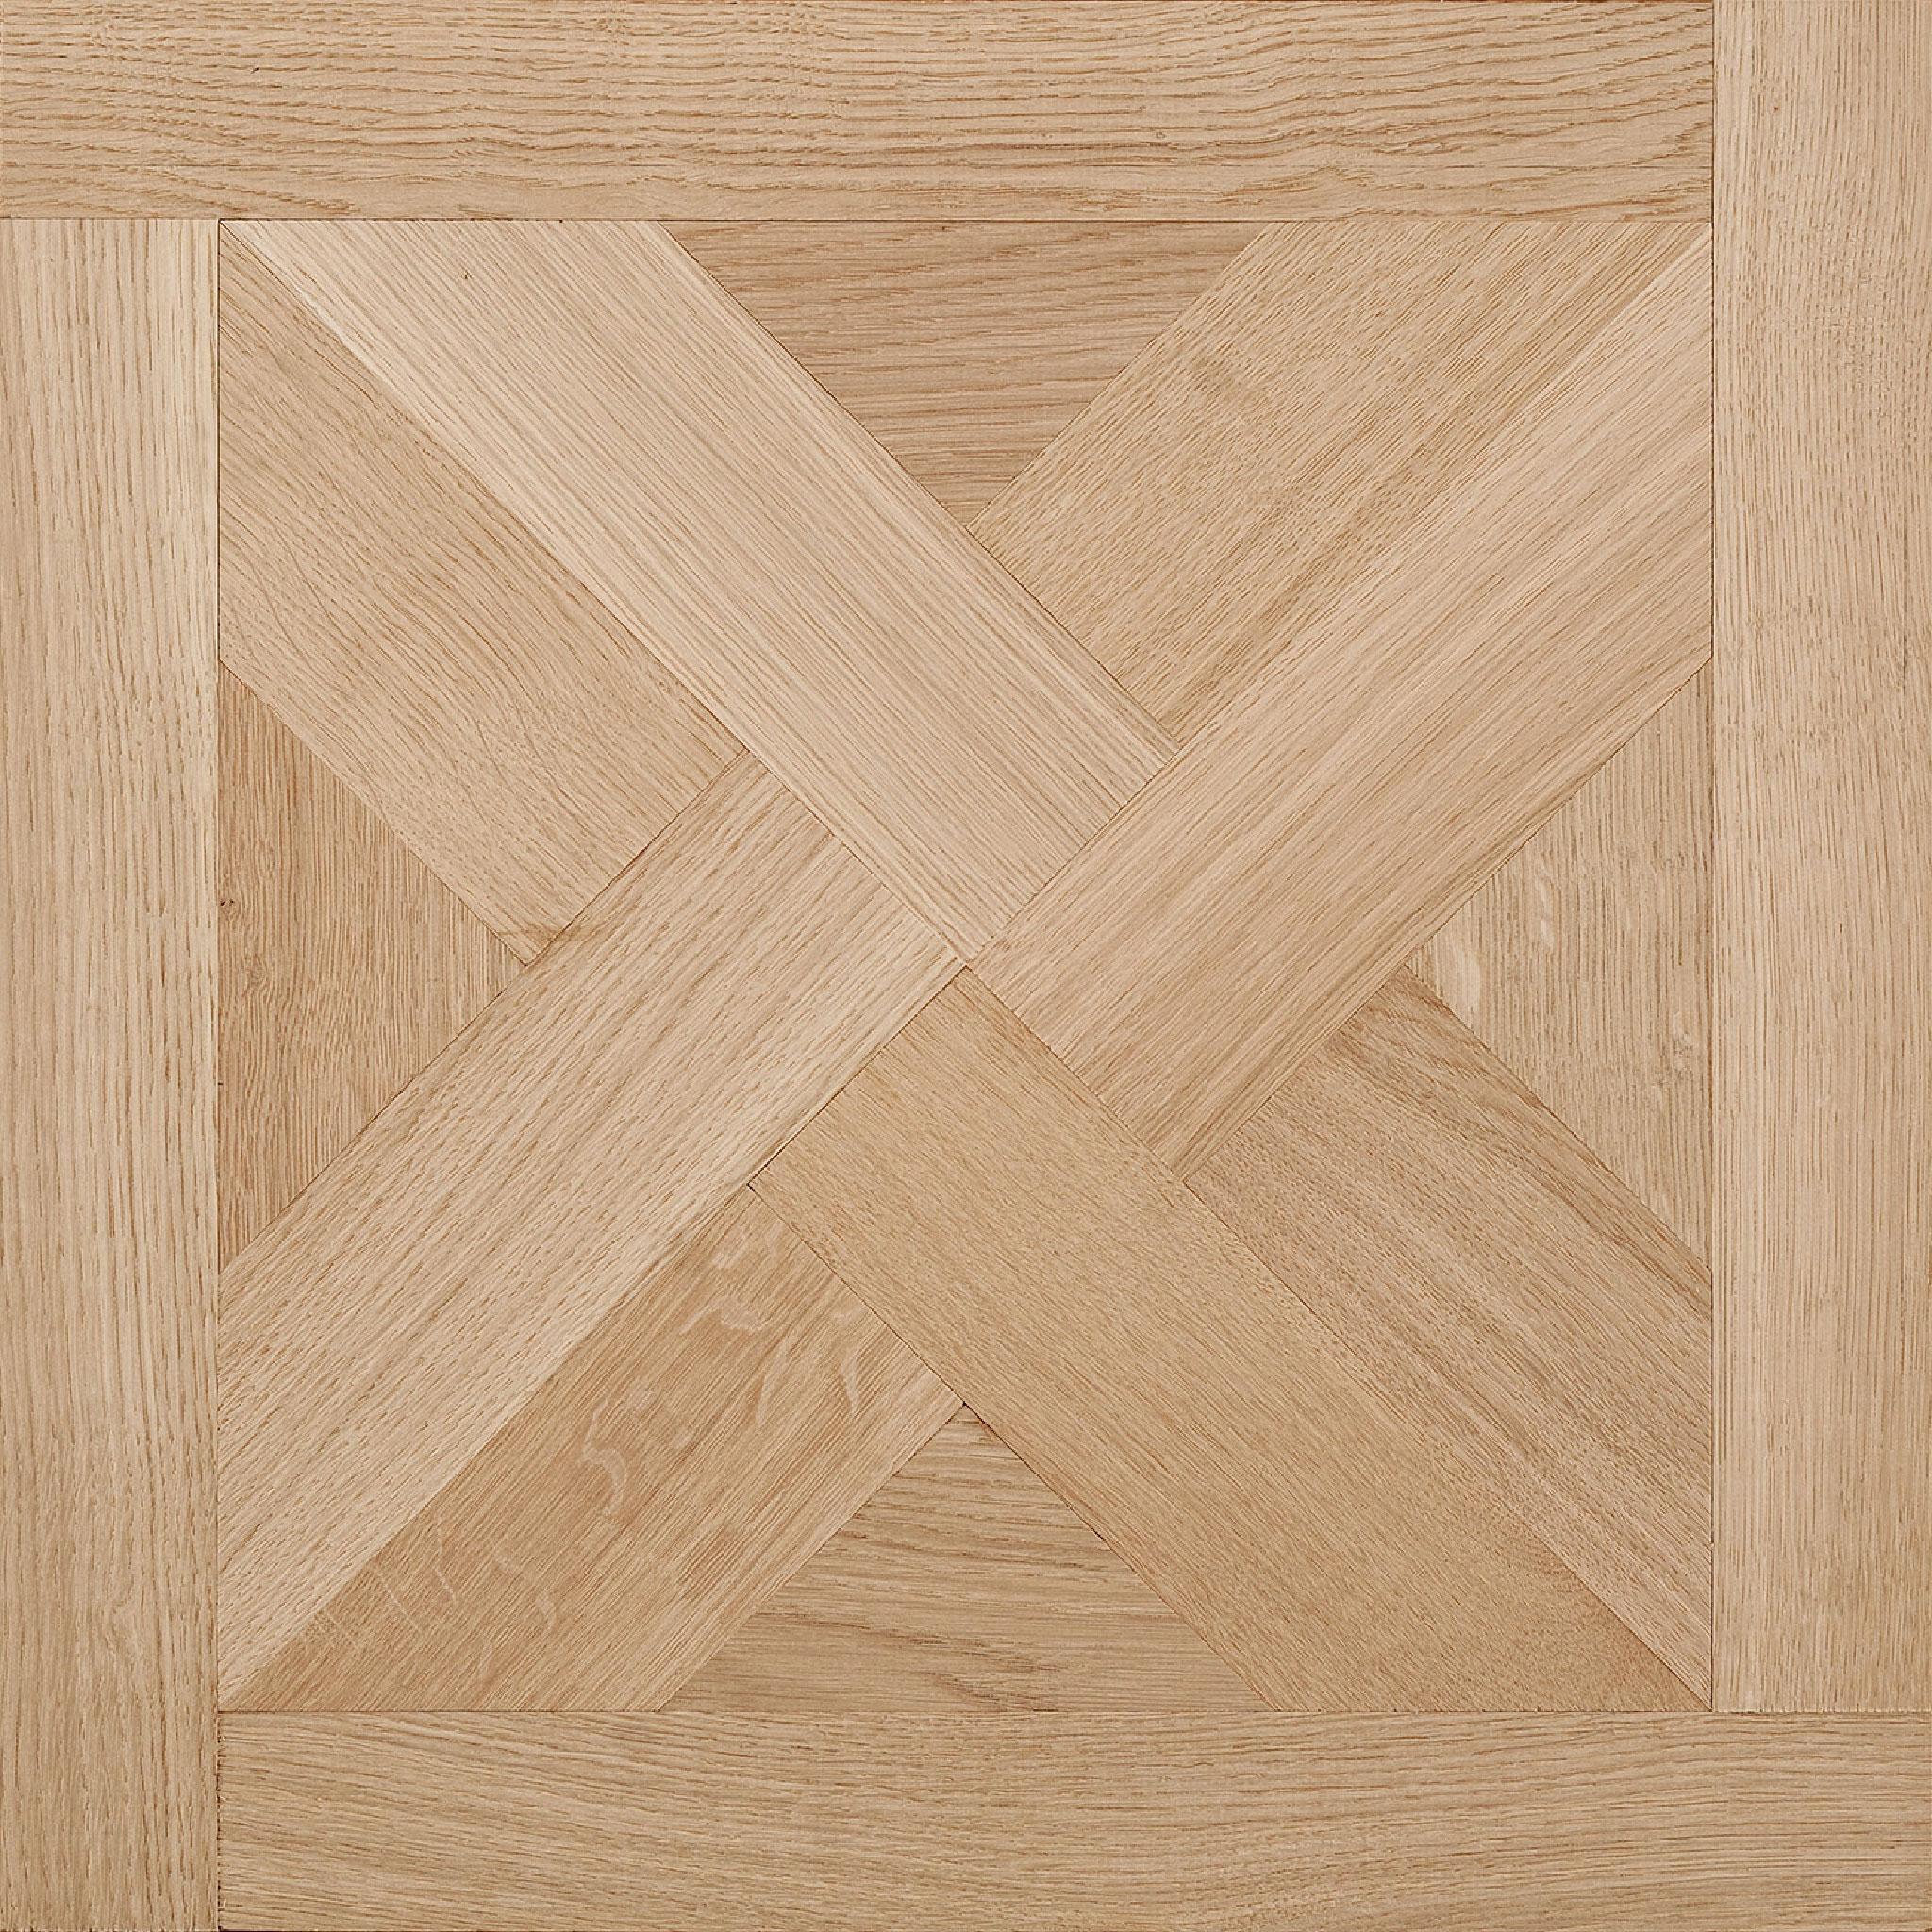 Designparquet oak cardiff nature 10mm